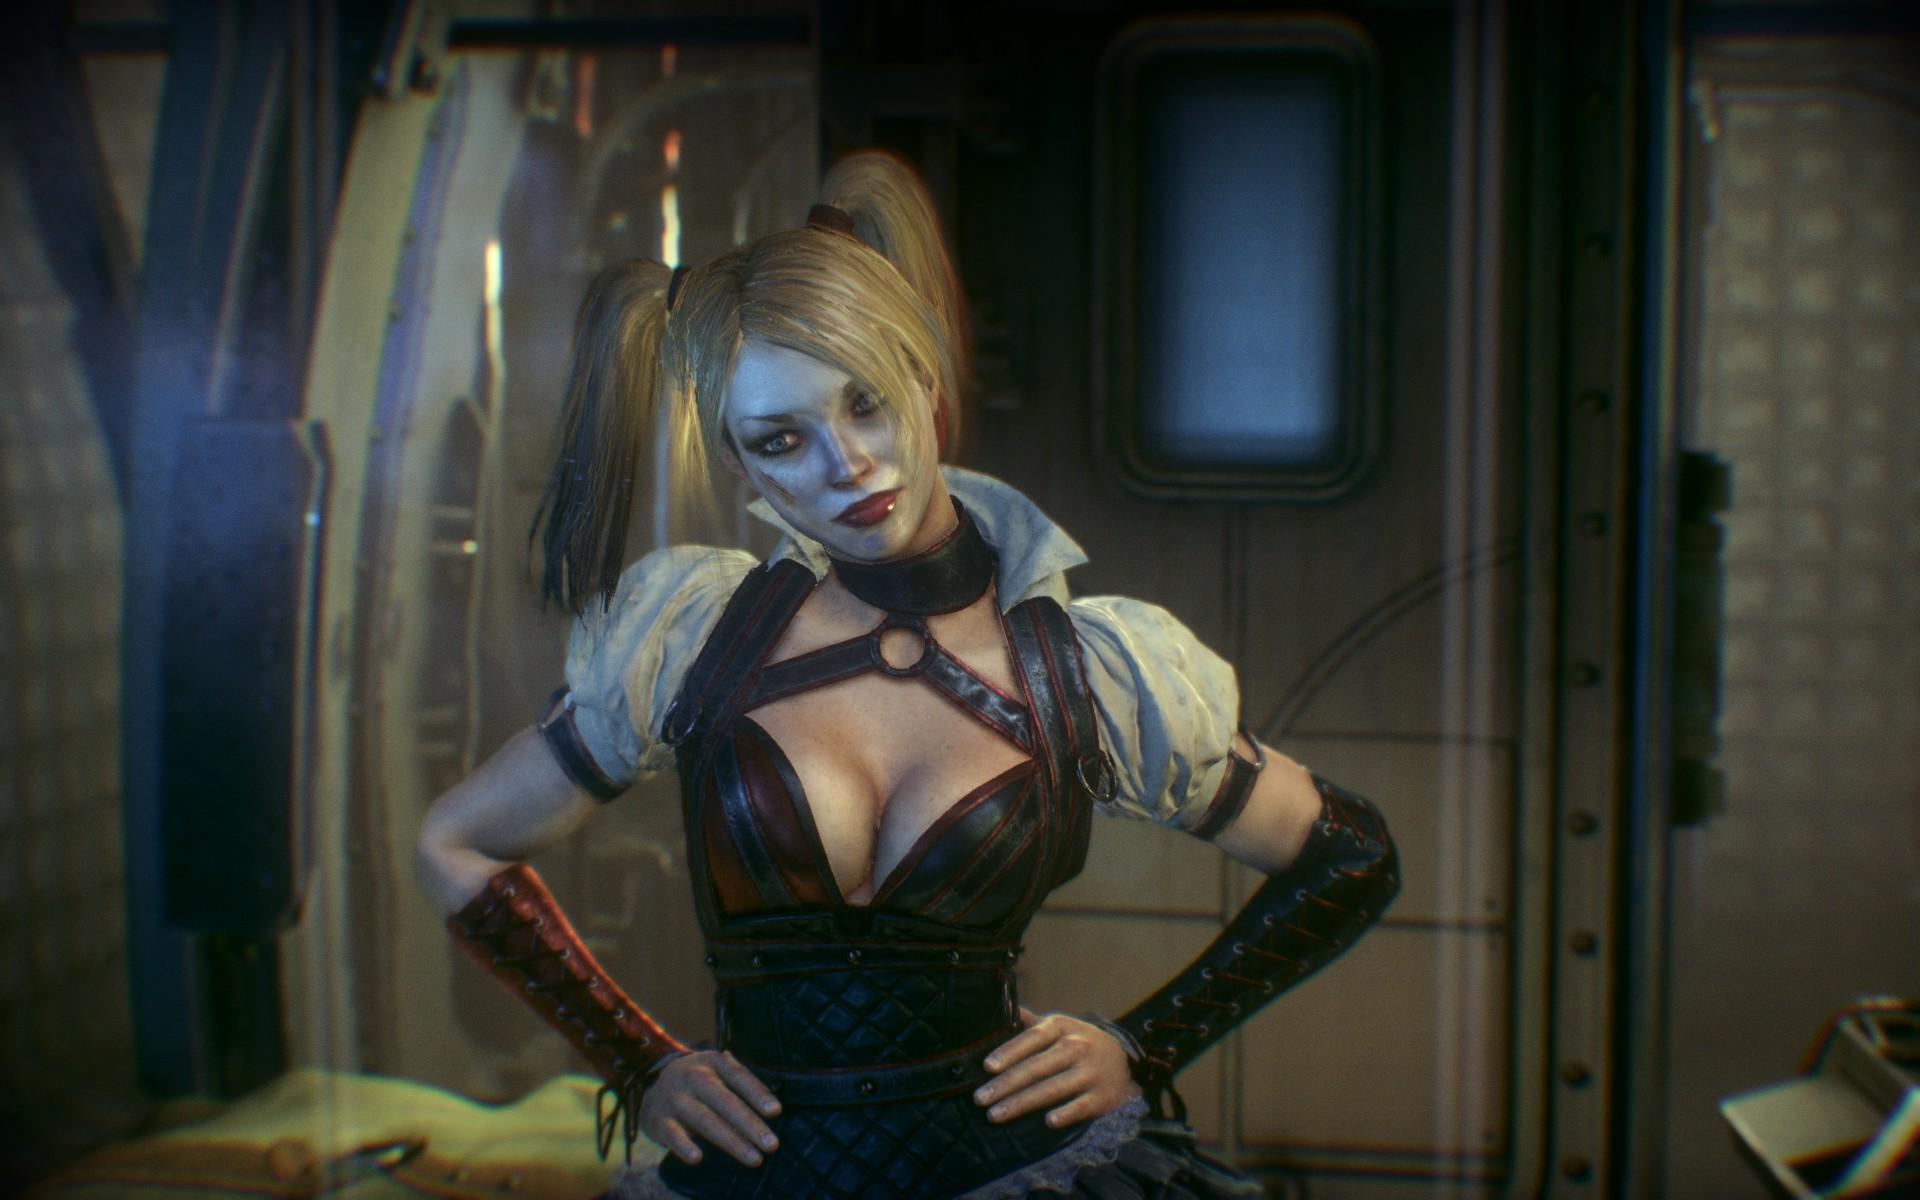 Wallpaper Video Games Anime Batman Arkham Knight Harley Quinn